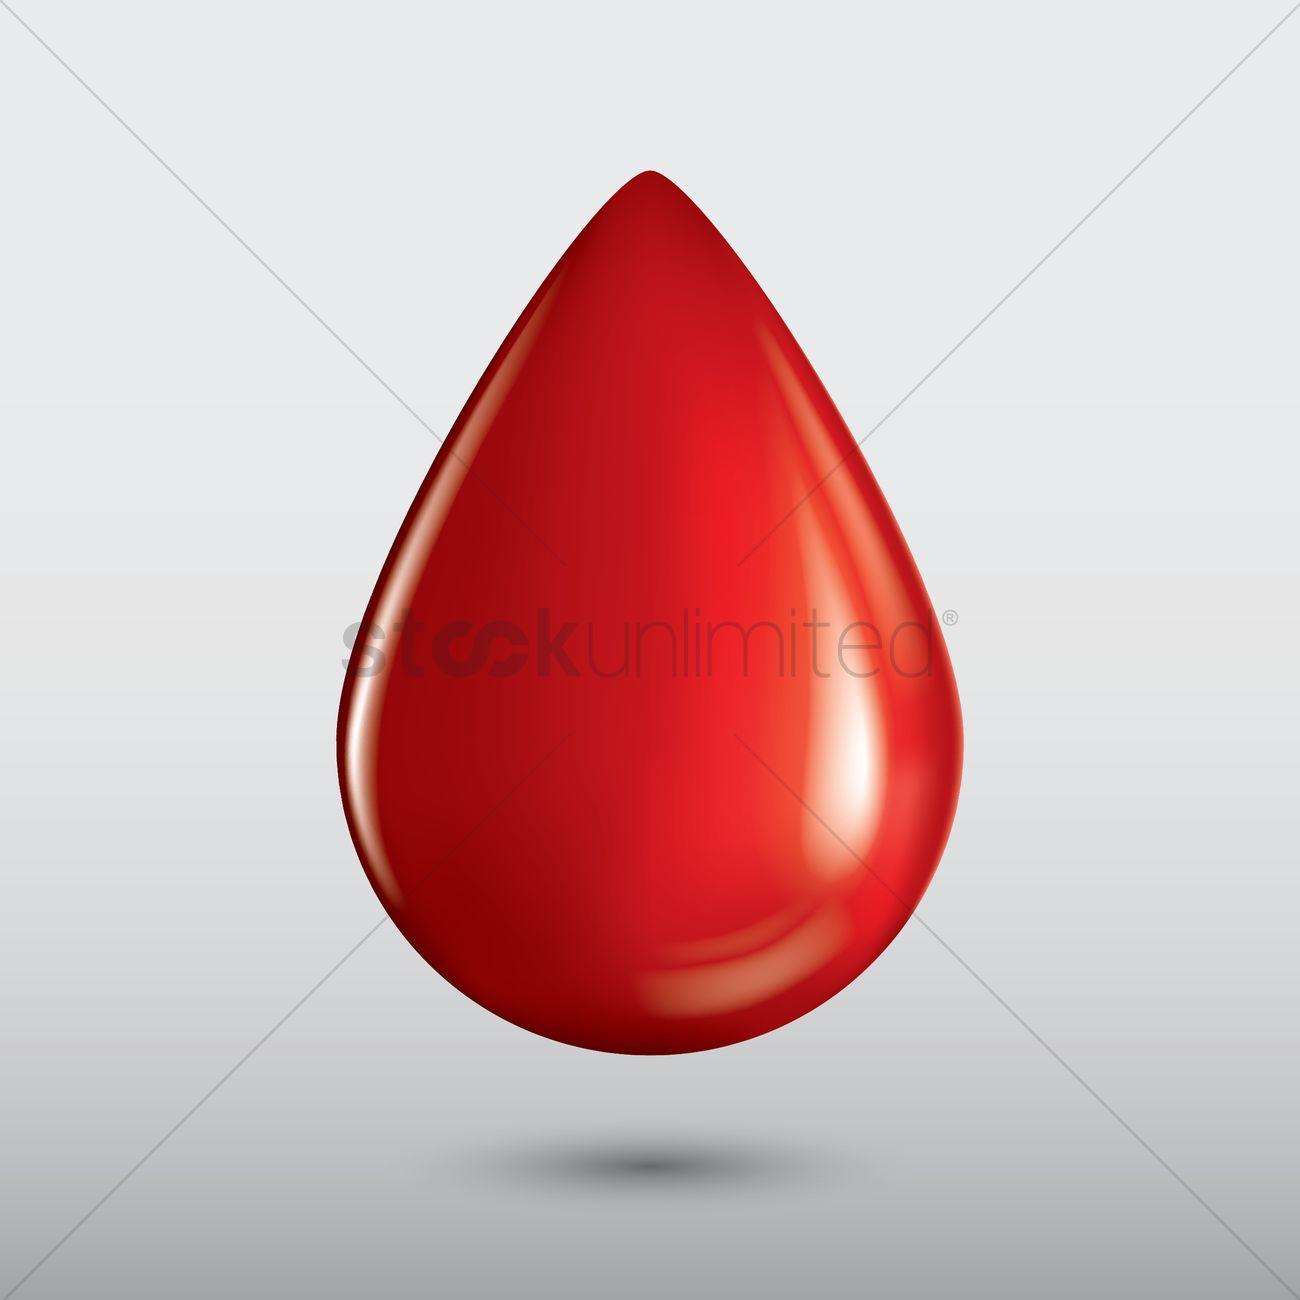 1300x1300 Blood Drop Vector Image